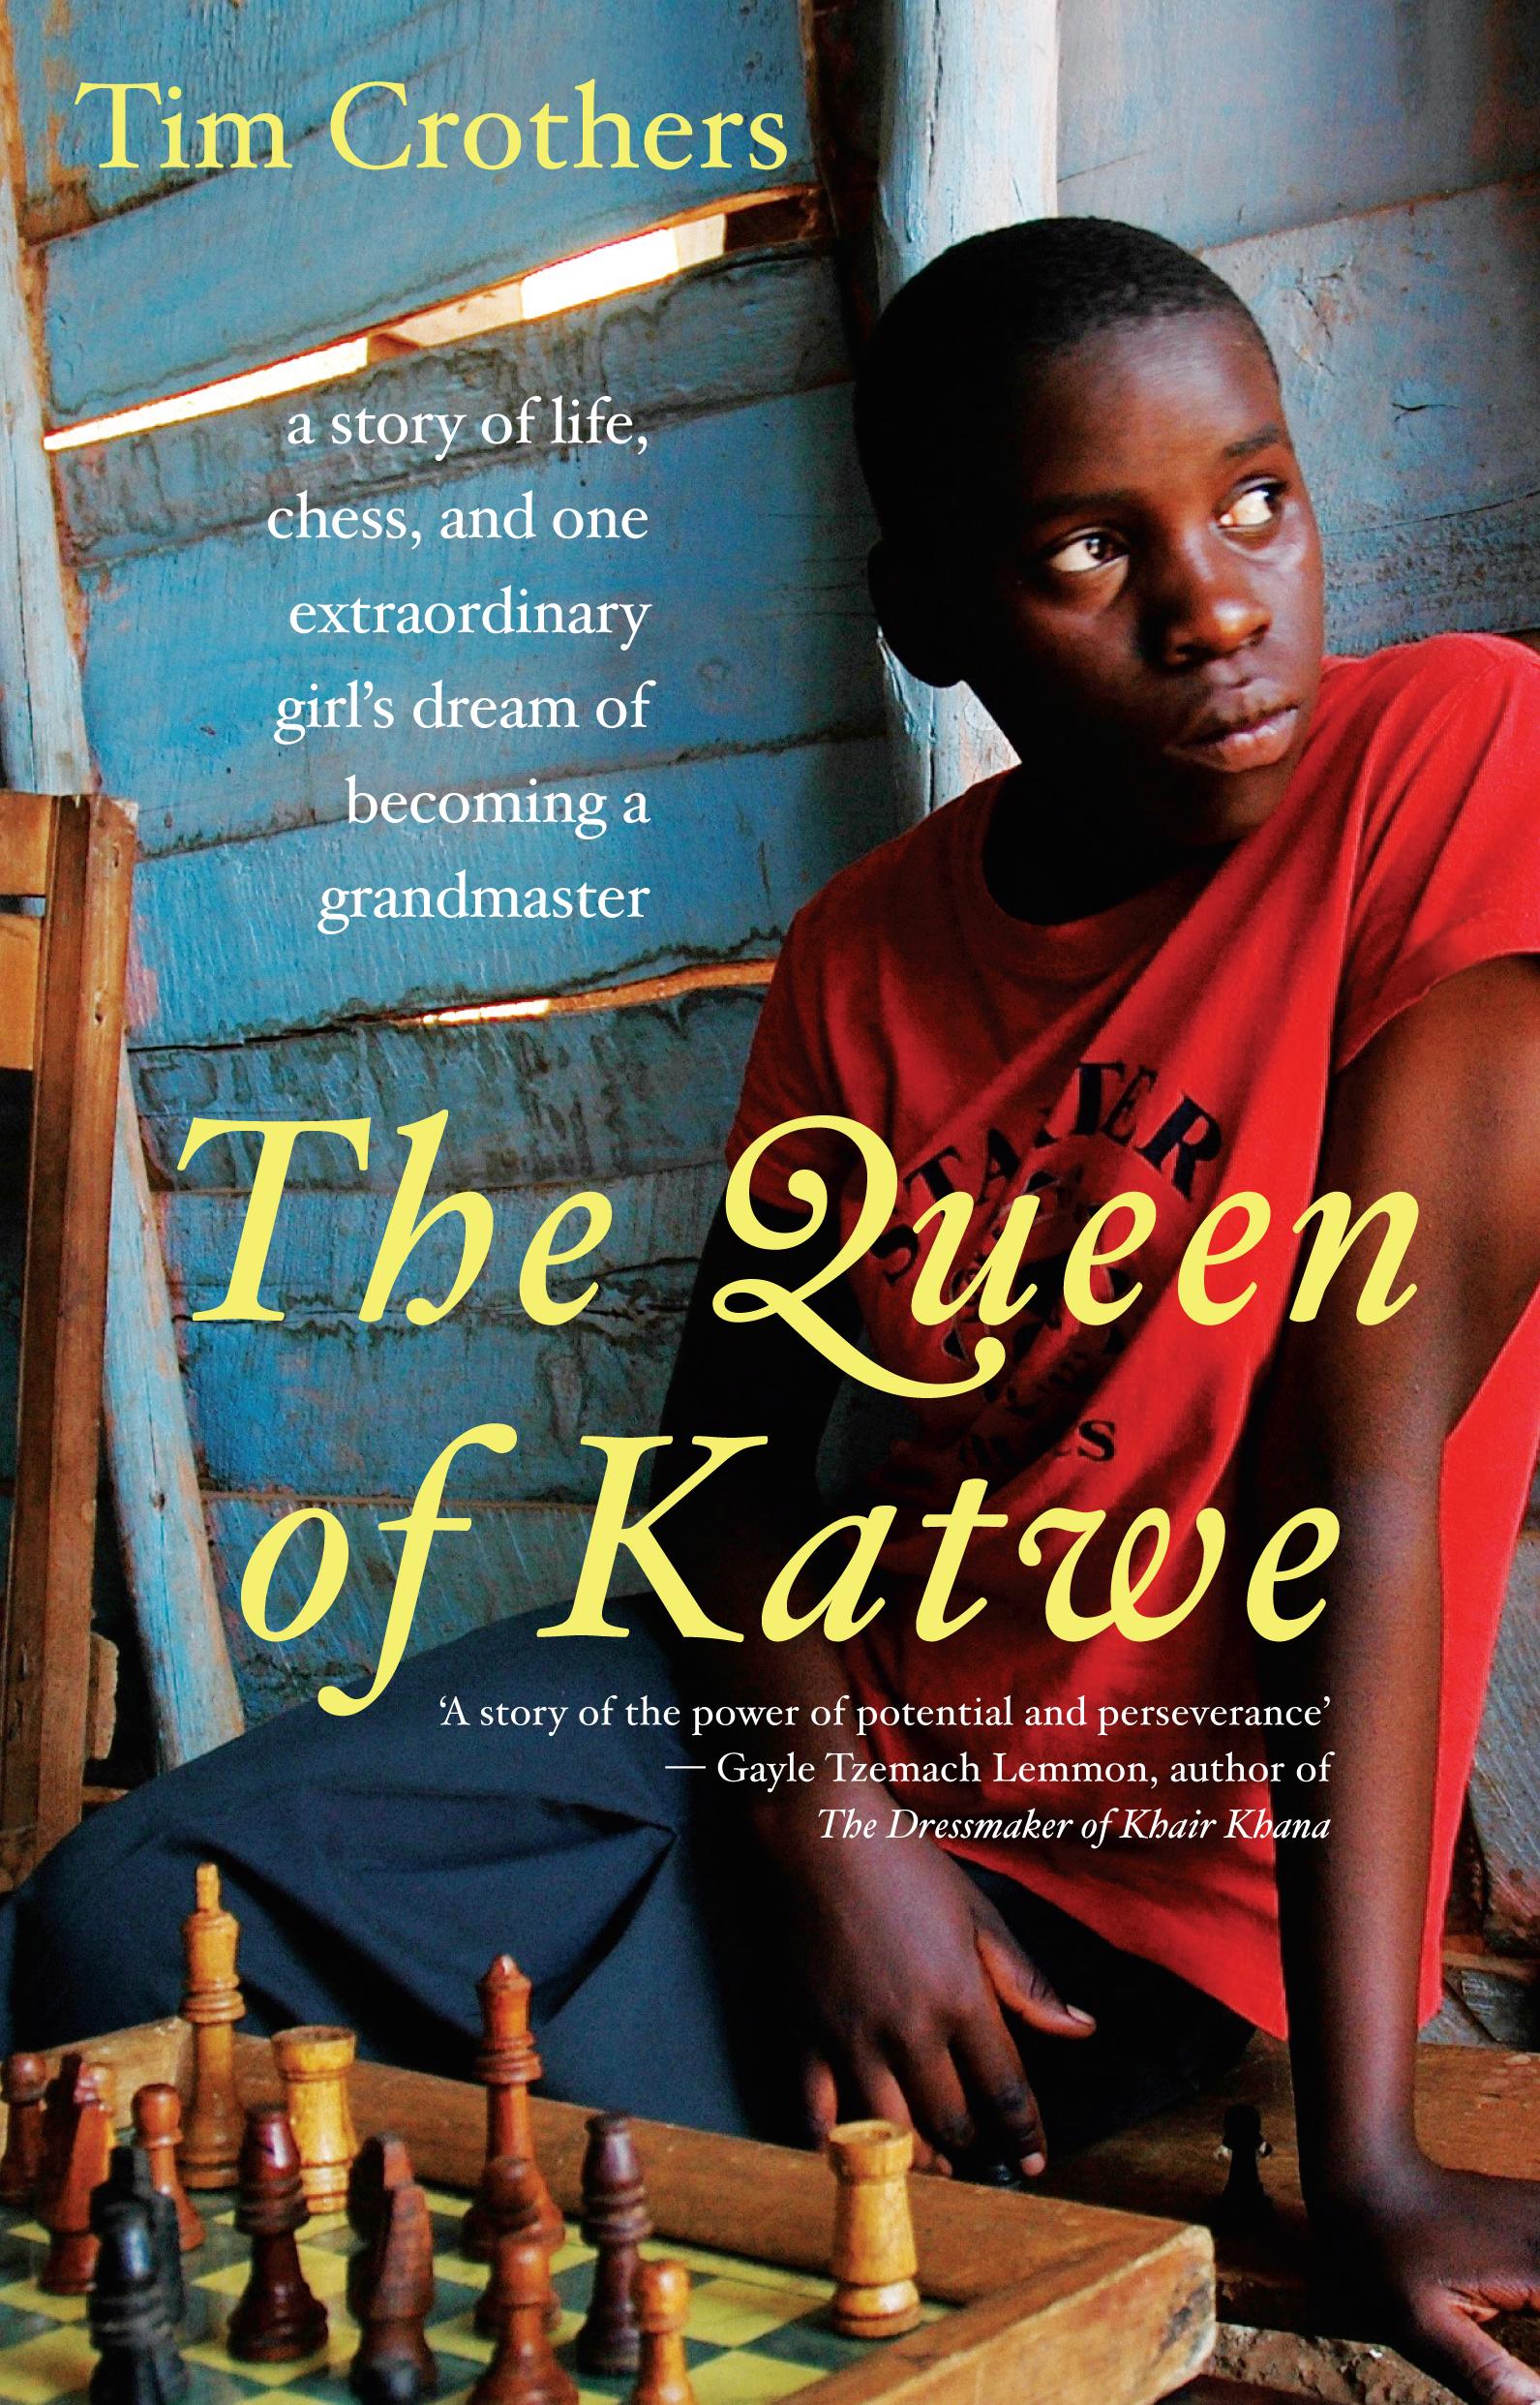 La Dame de Katwe [Disney - 2016] C9781922070159